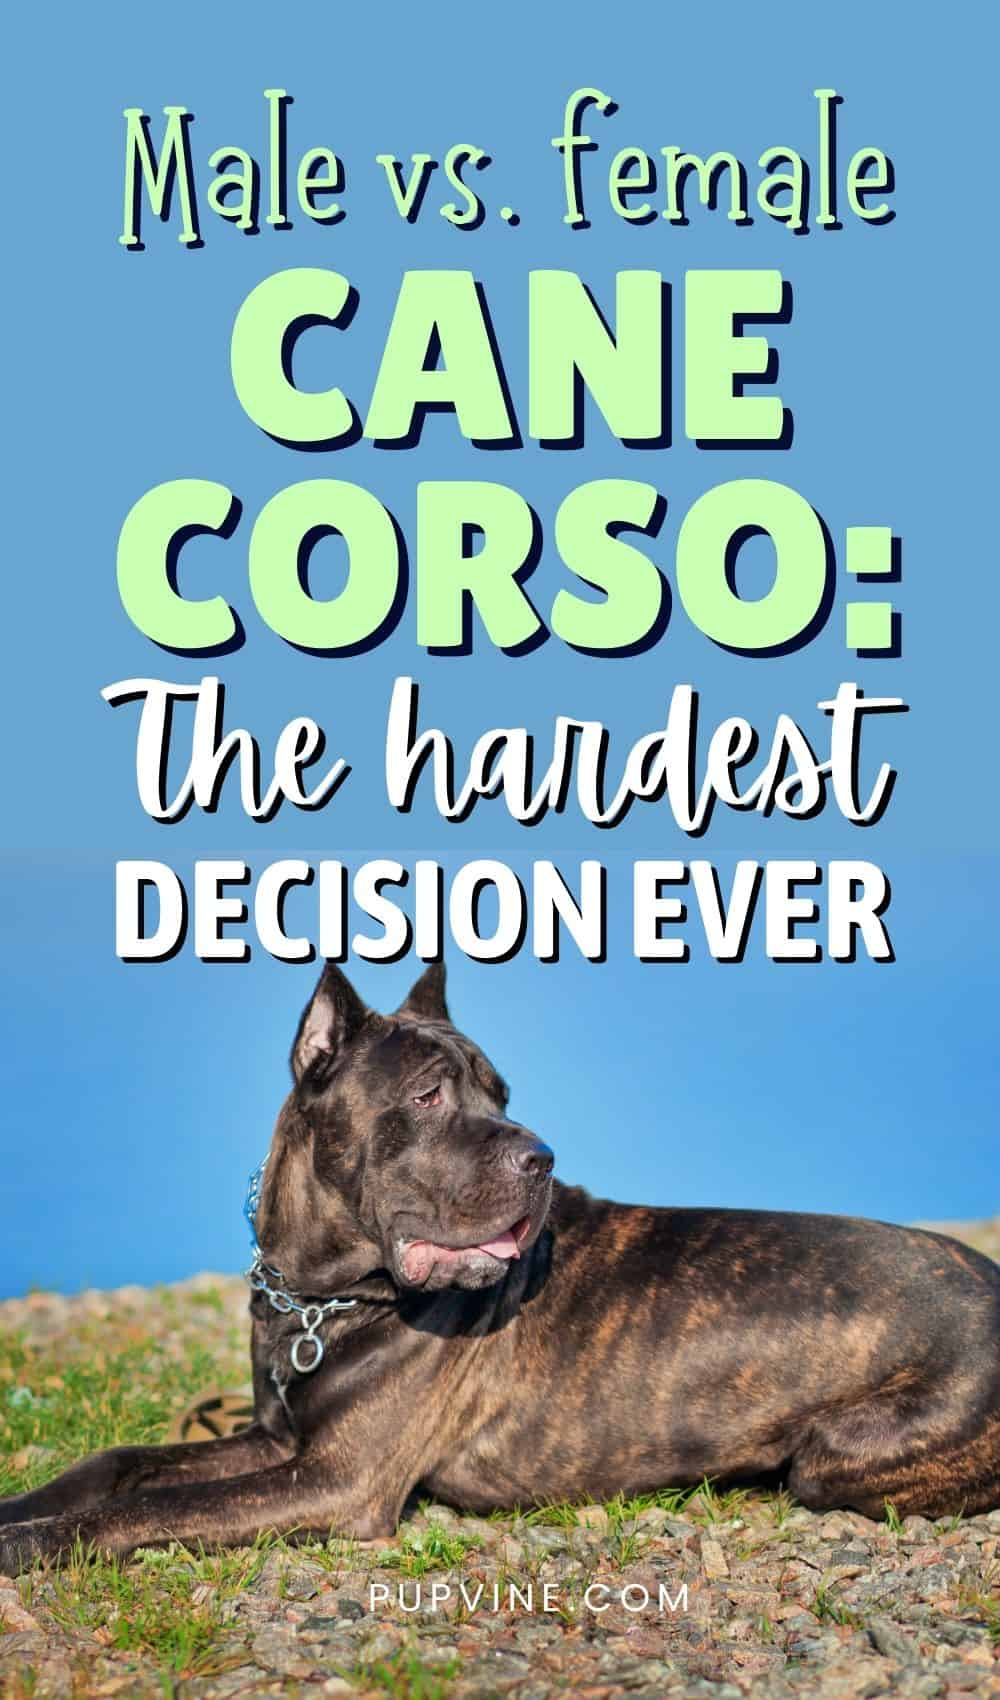 Male Vs. Female Cane Corso The Hardest Decision Ever